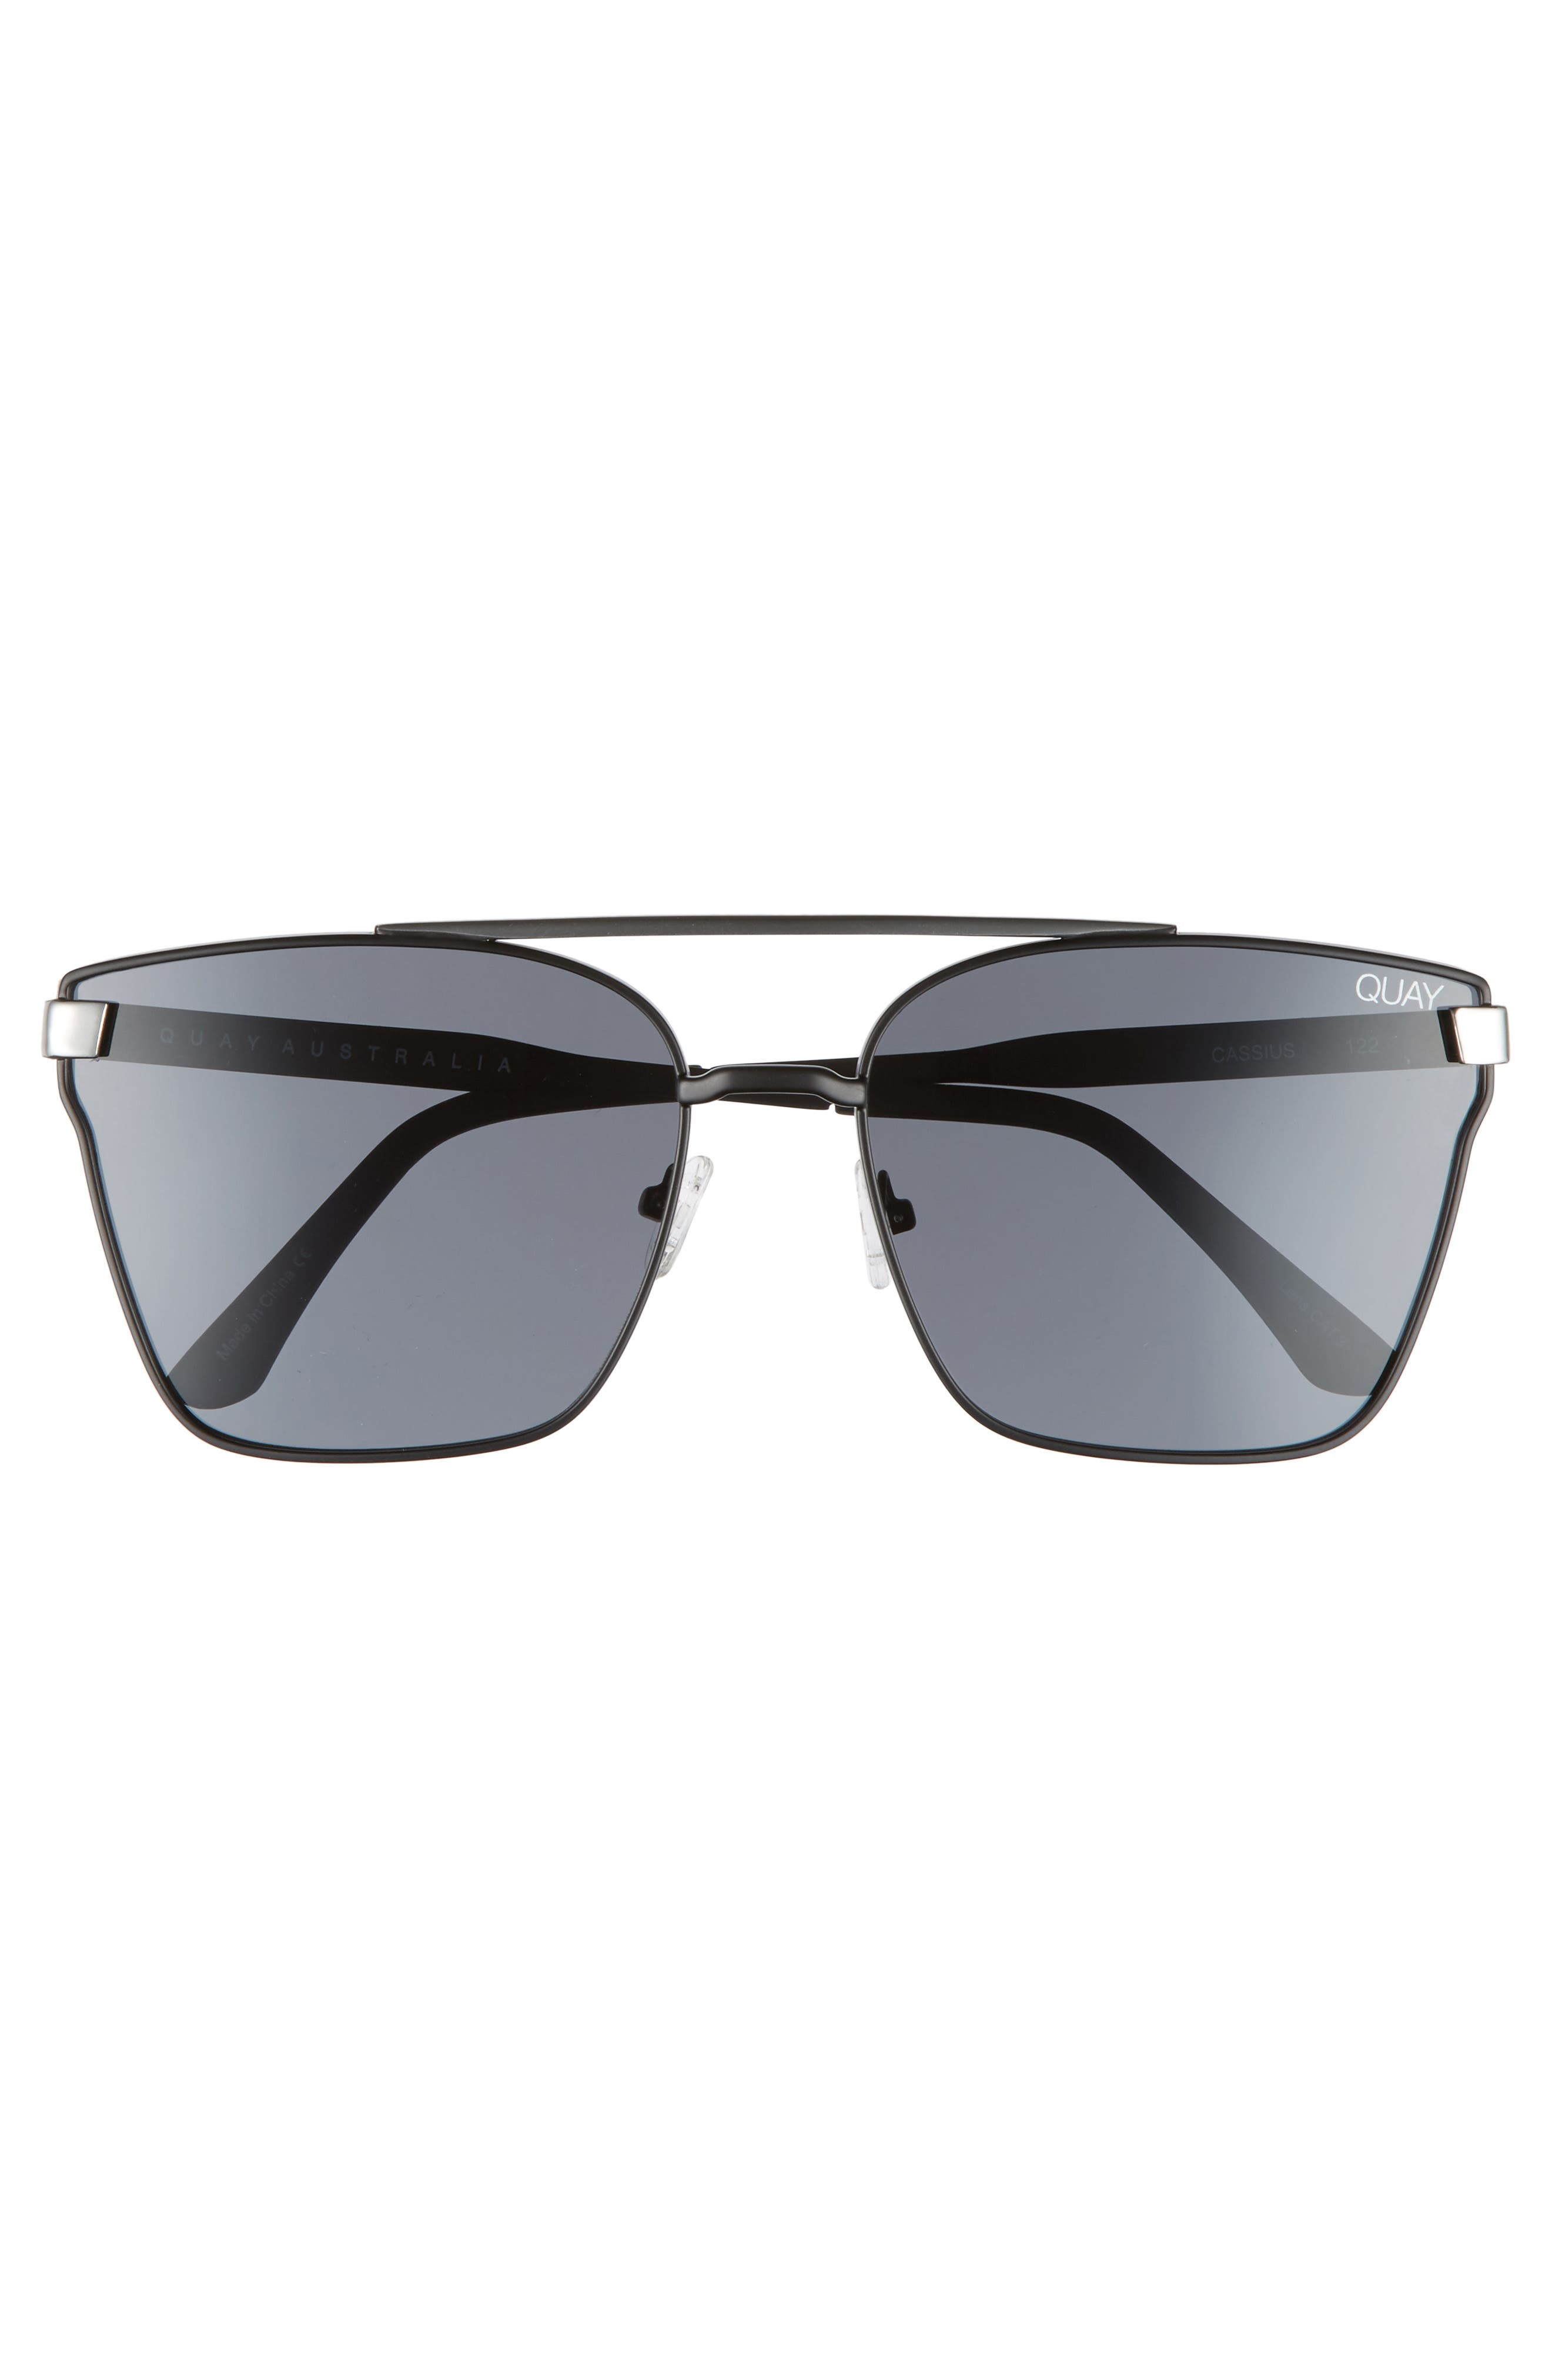 Cassius 59mm Navigator Sunglasses,                             Alternate thumbnail 2, color,                             001